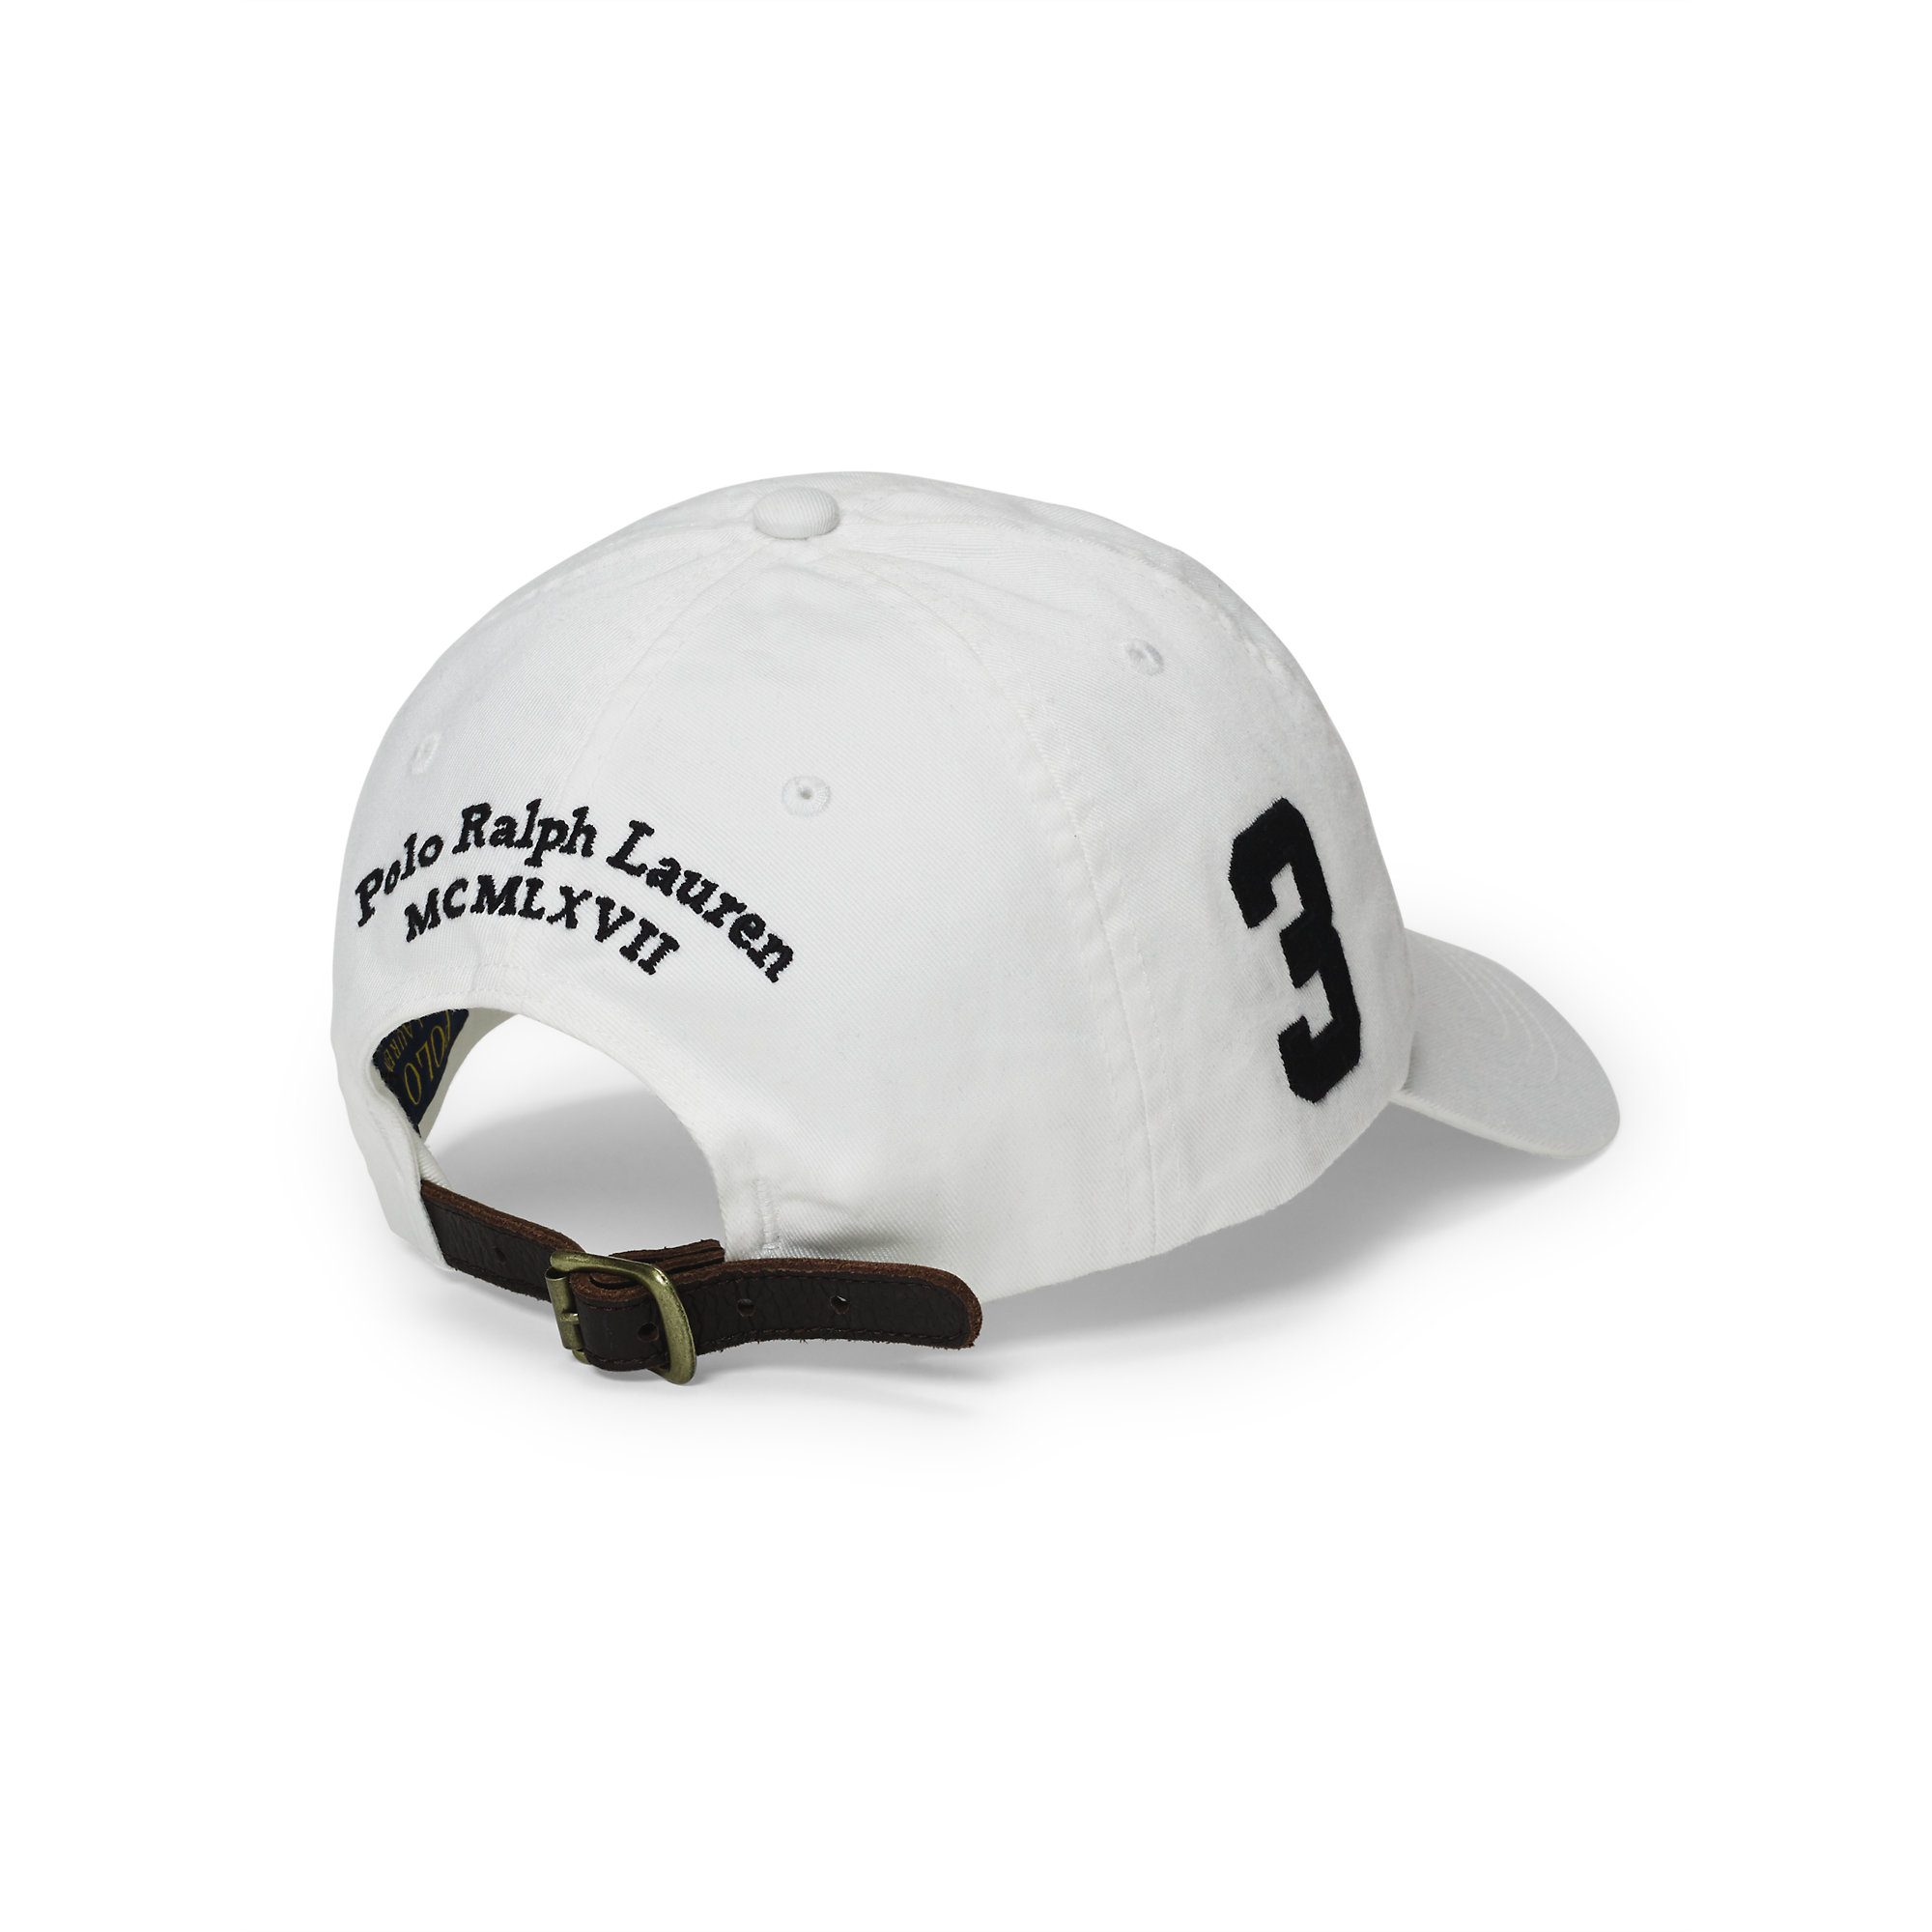 c70437e736827 Polo Ralph Lauren Big Pony Chino Baseball Cap in White for Men - Lyst